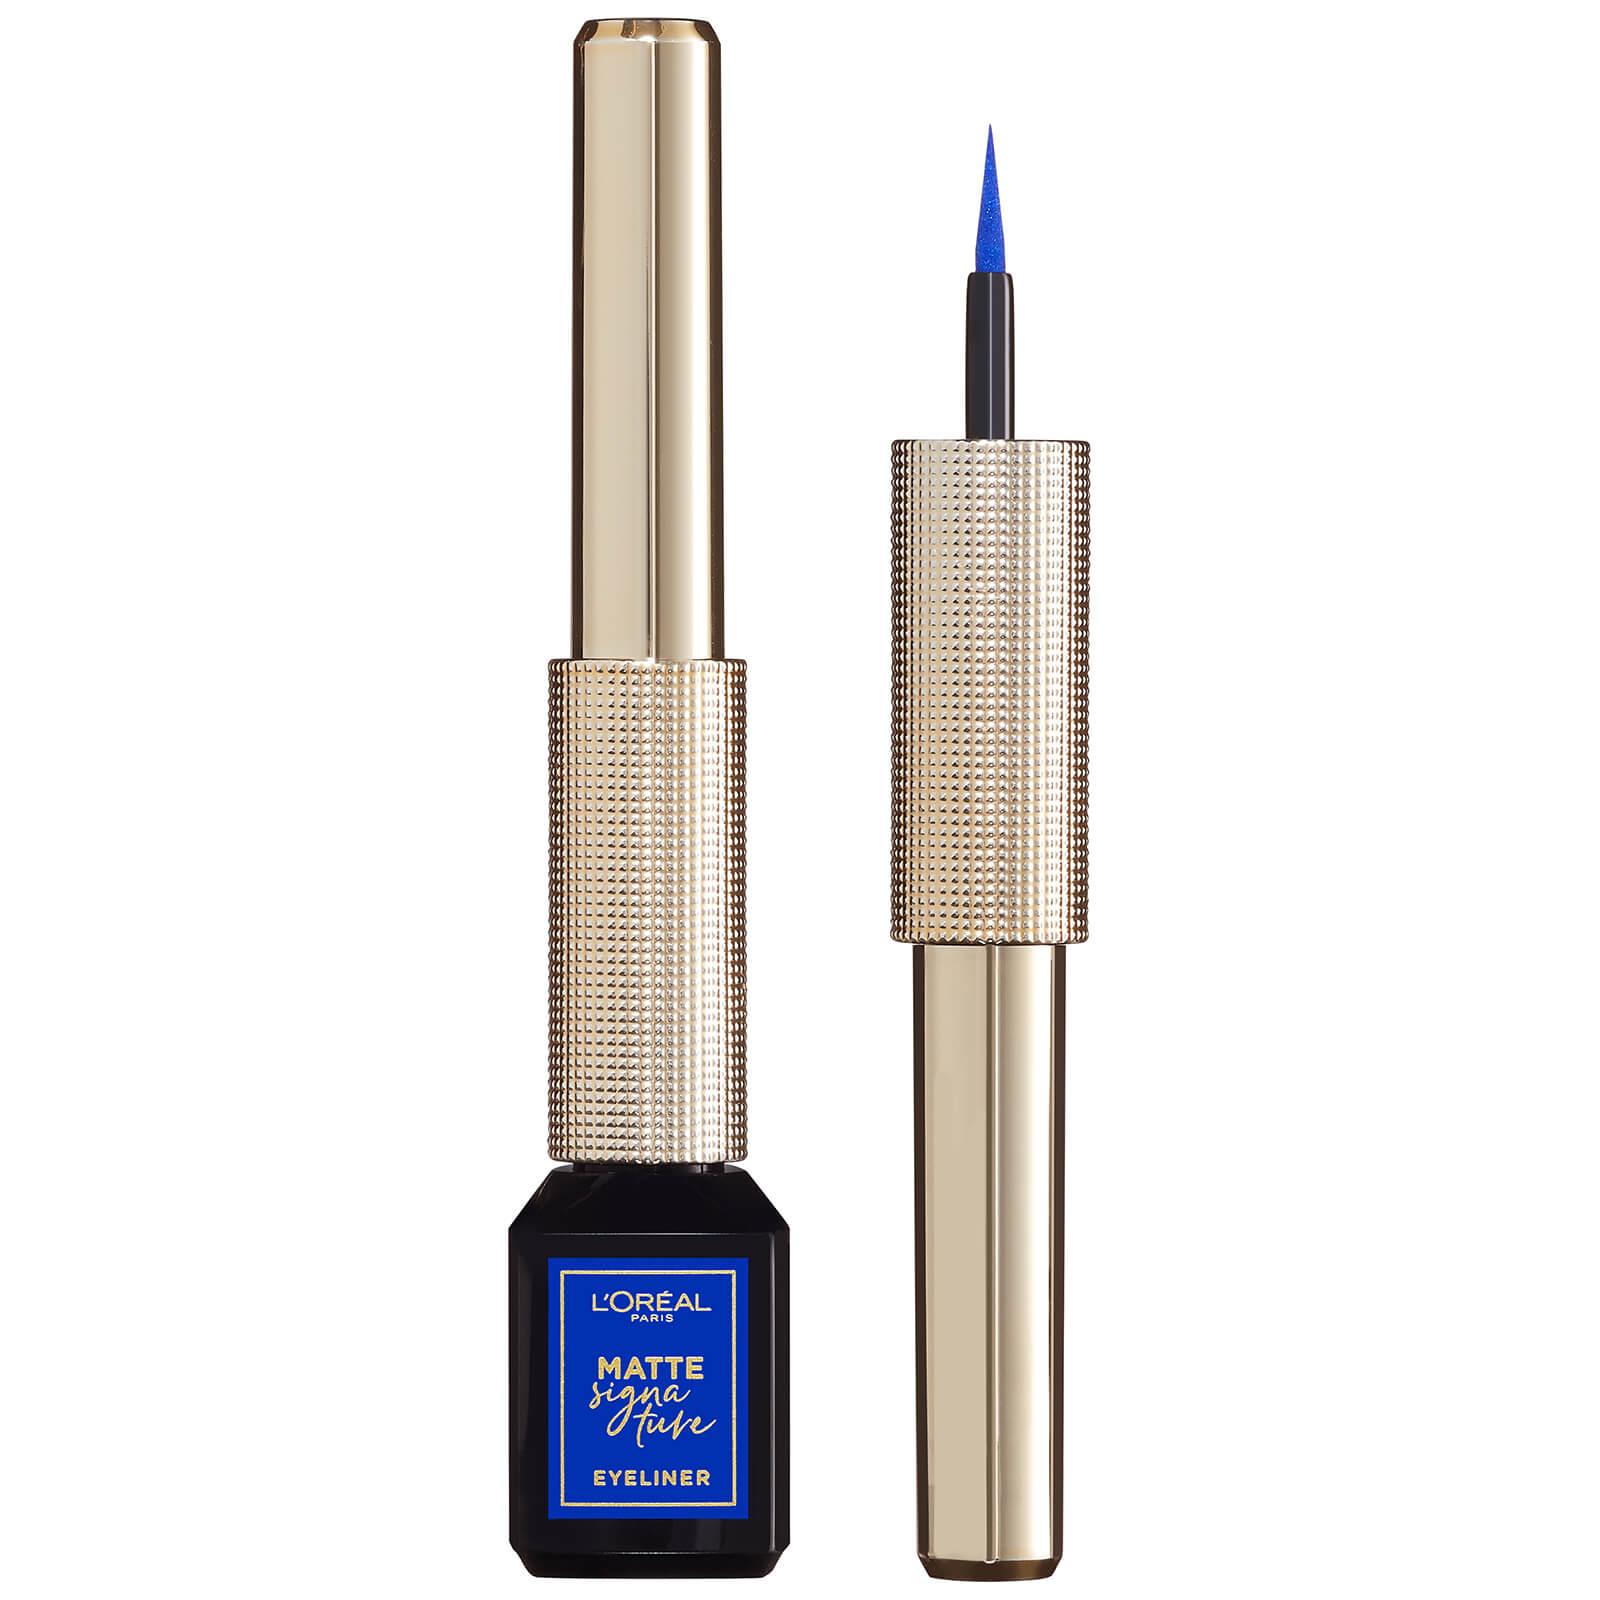 L'Oréal Paris Matte Signature Liquid Eyeliner 3ml (Various Shades) - 02 Blue